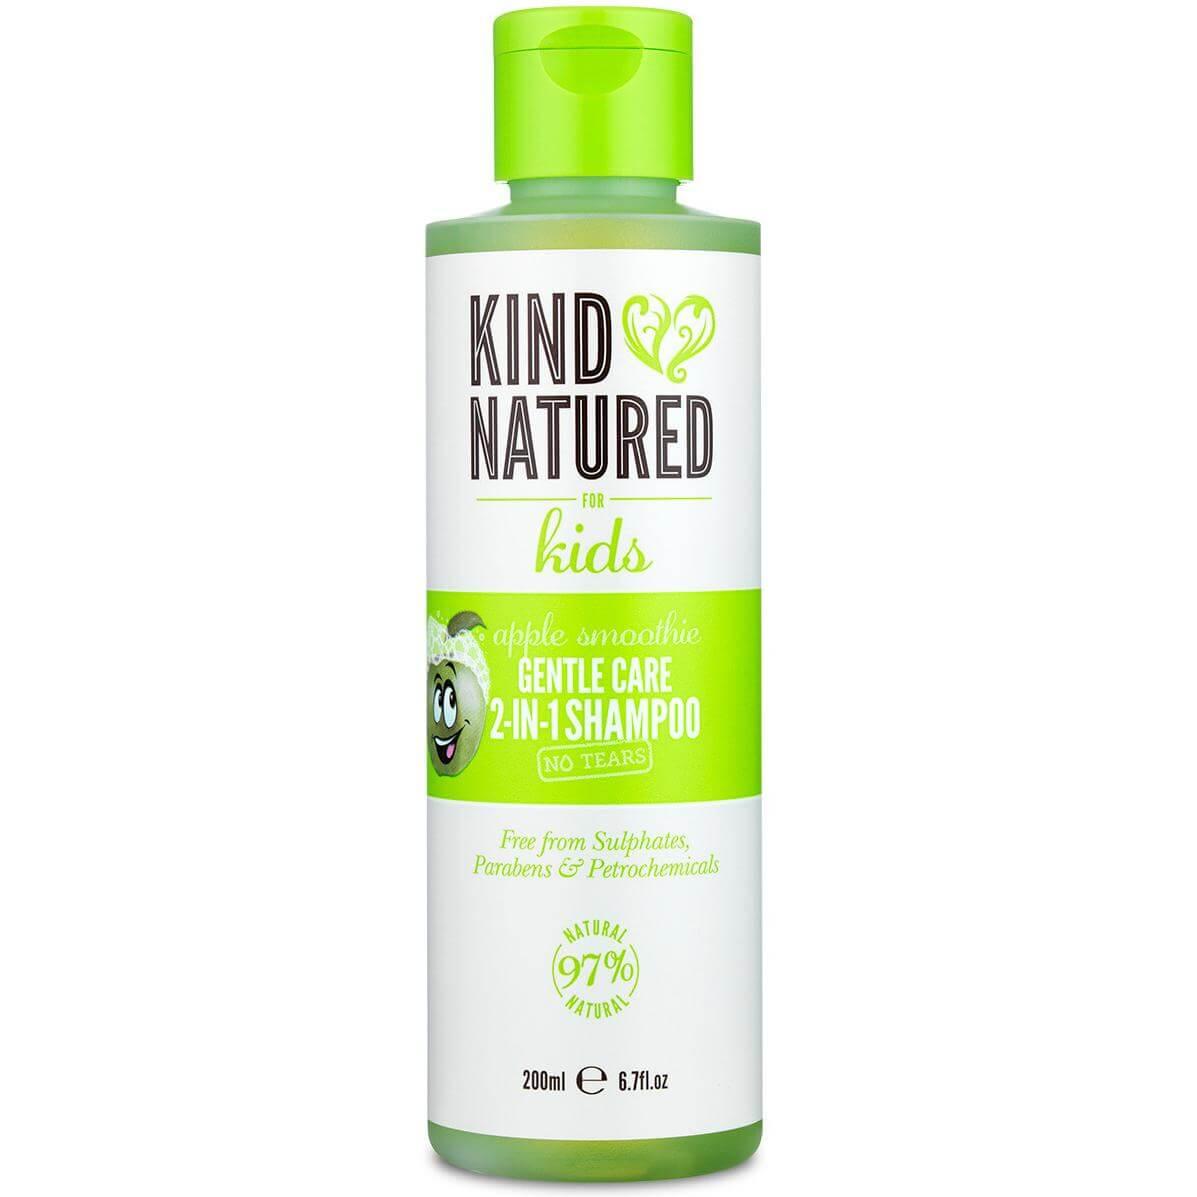 Kind Natured Apple Smoothie Gentle Care 2-In-1 Shampoo No Tears Παιδικό Σαμπουάν μητέρα παιδί   περιποίηση για το παιδί   σαμπουάν για το παιδί